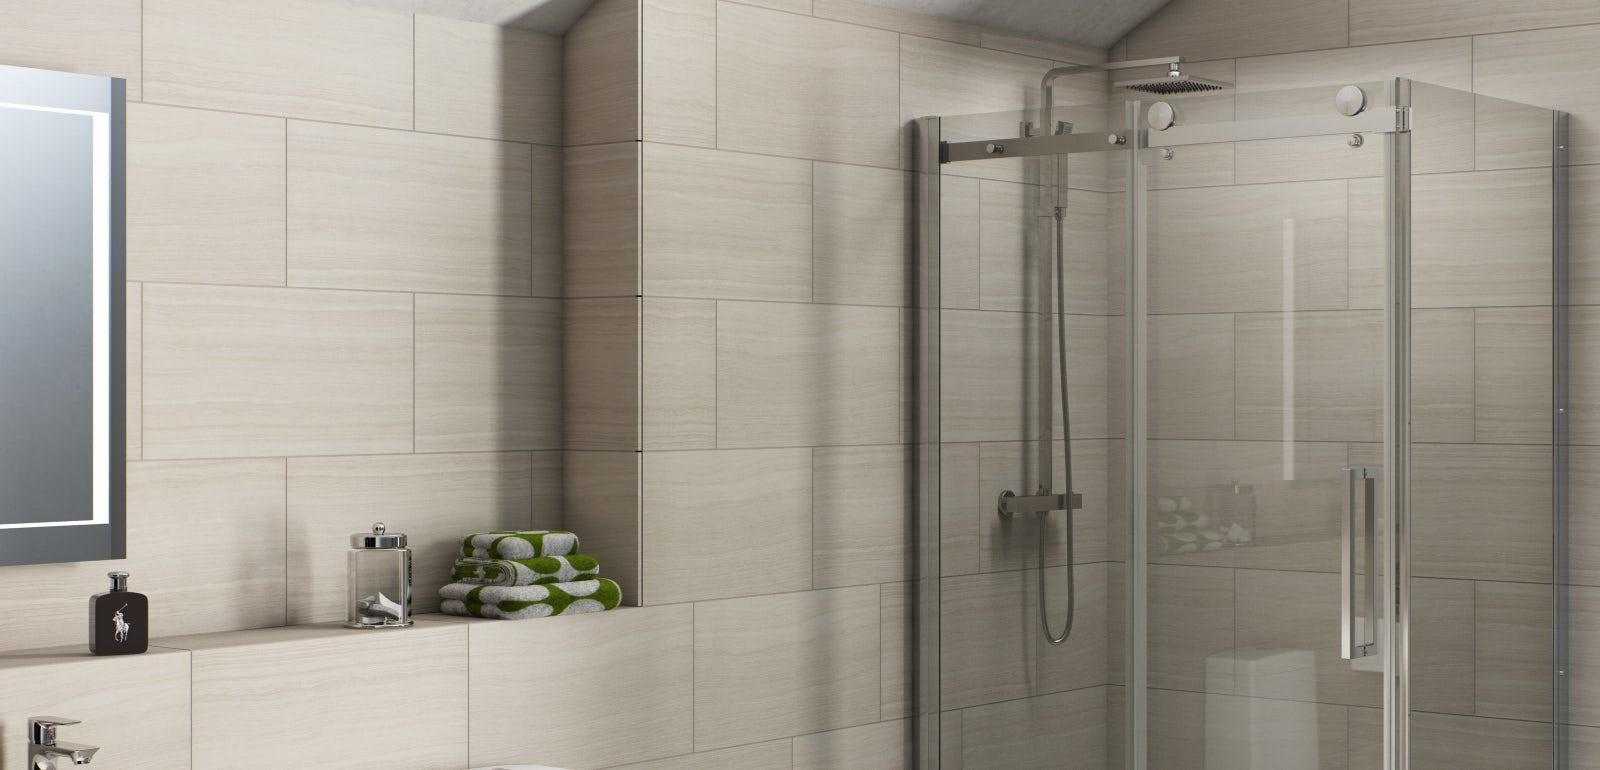 How to Fit a Shower Enclosure  VictoriaPlumcom